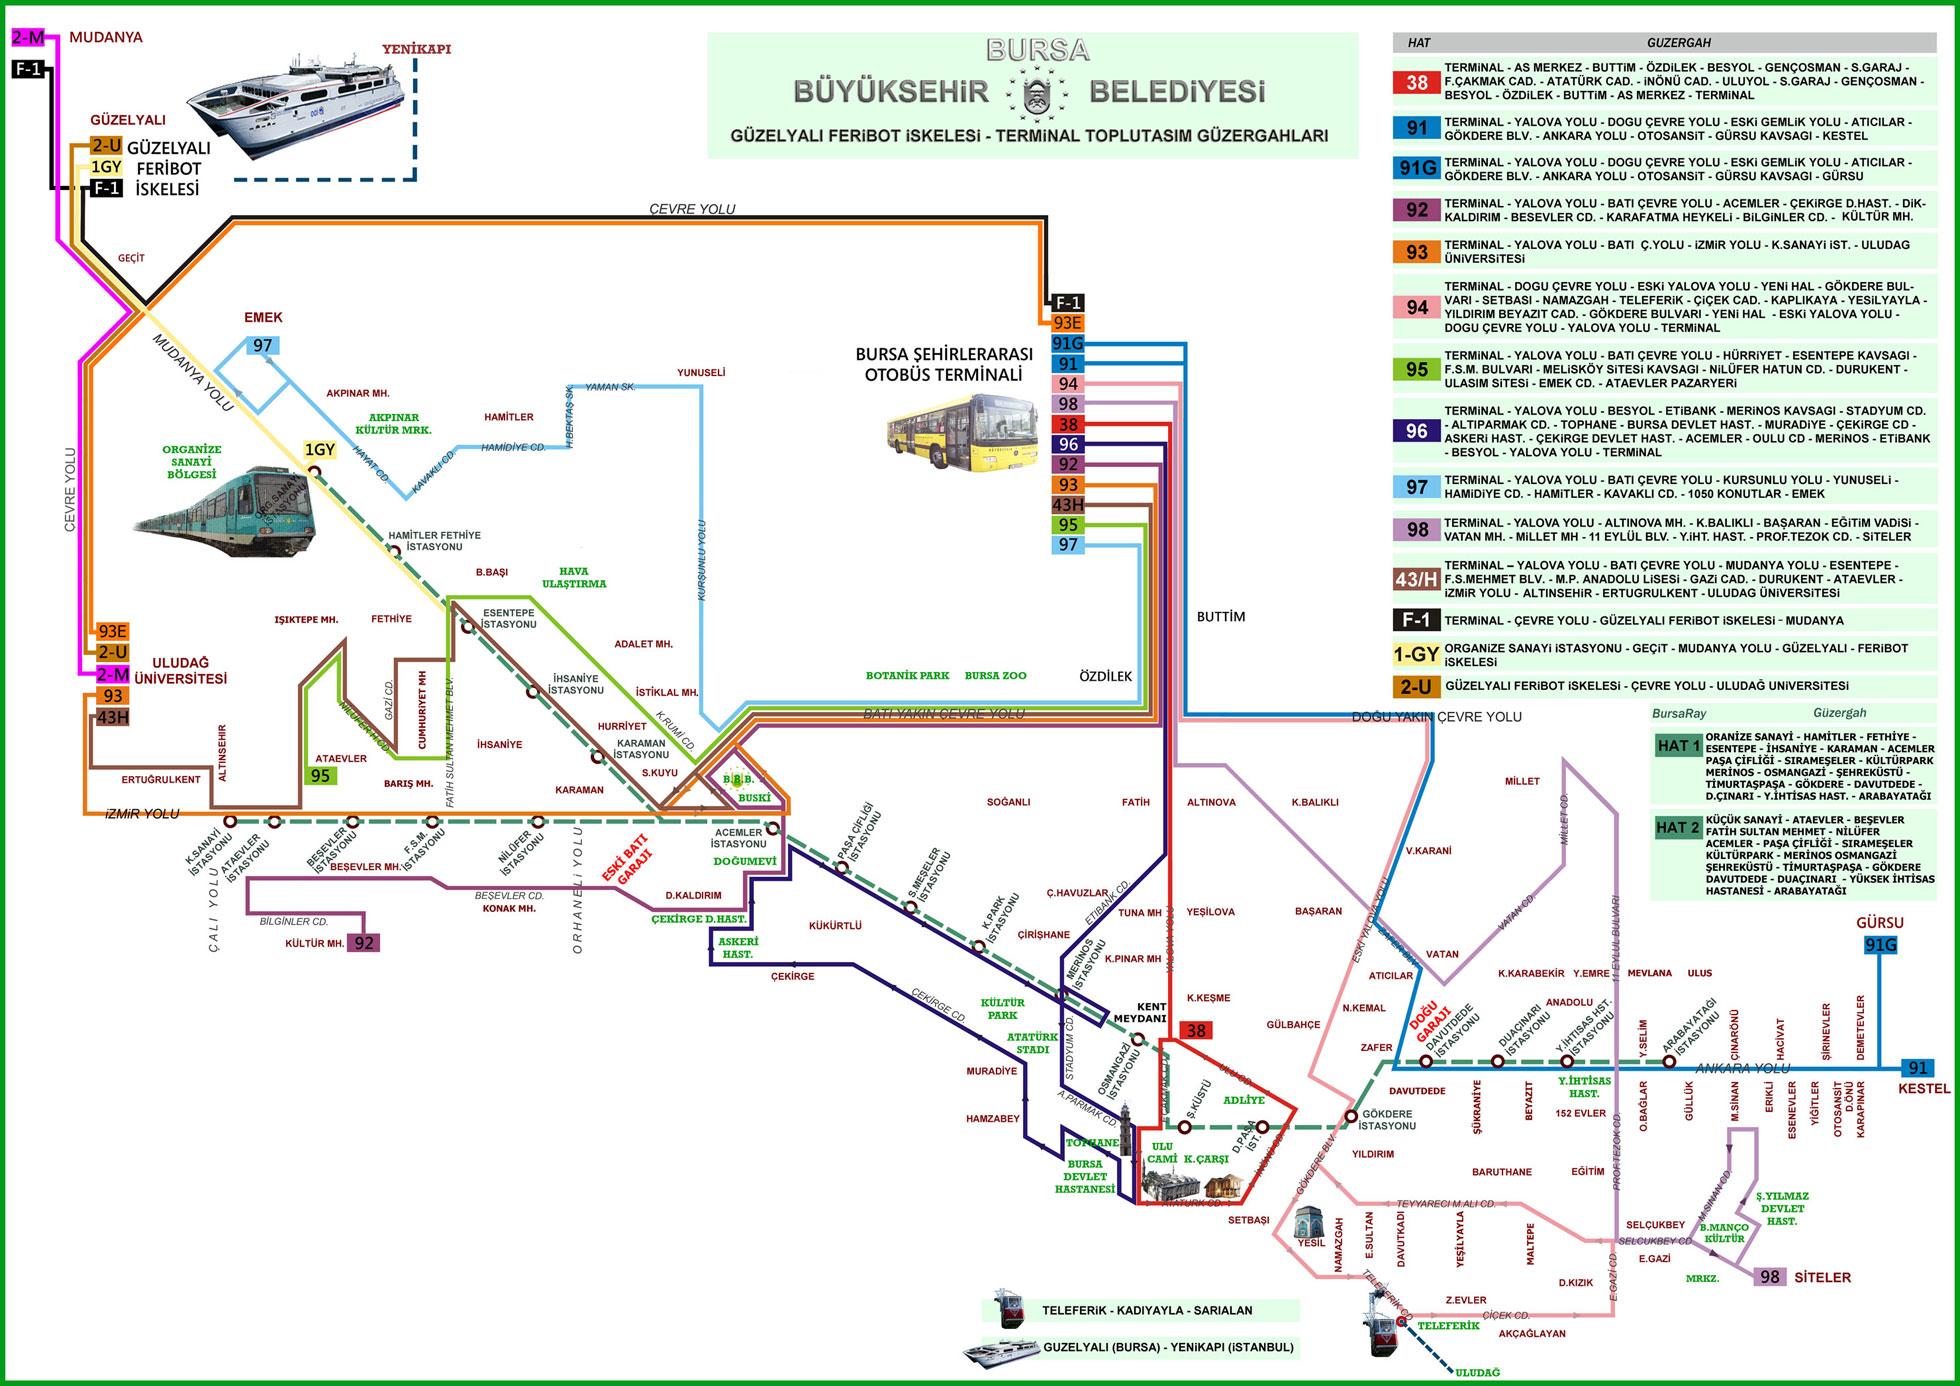 метро автобус в Бурсе